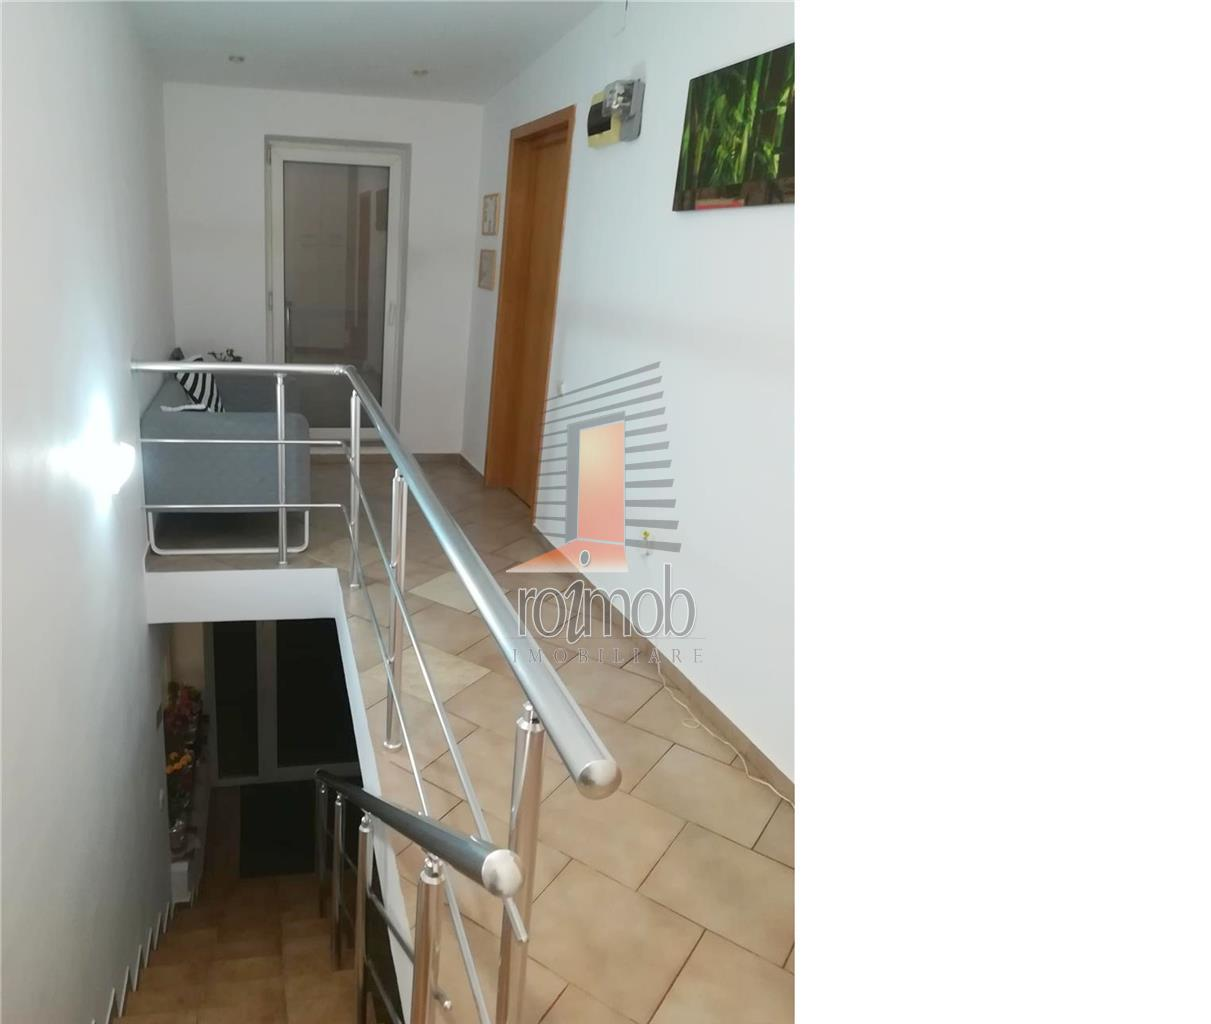 Apartament cu 4 camere in vila, birouri, 120 mp, Polona - metrou